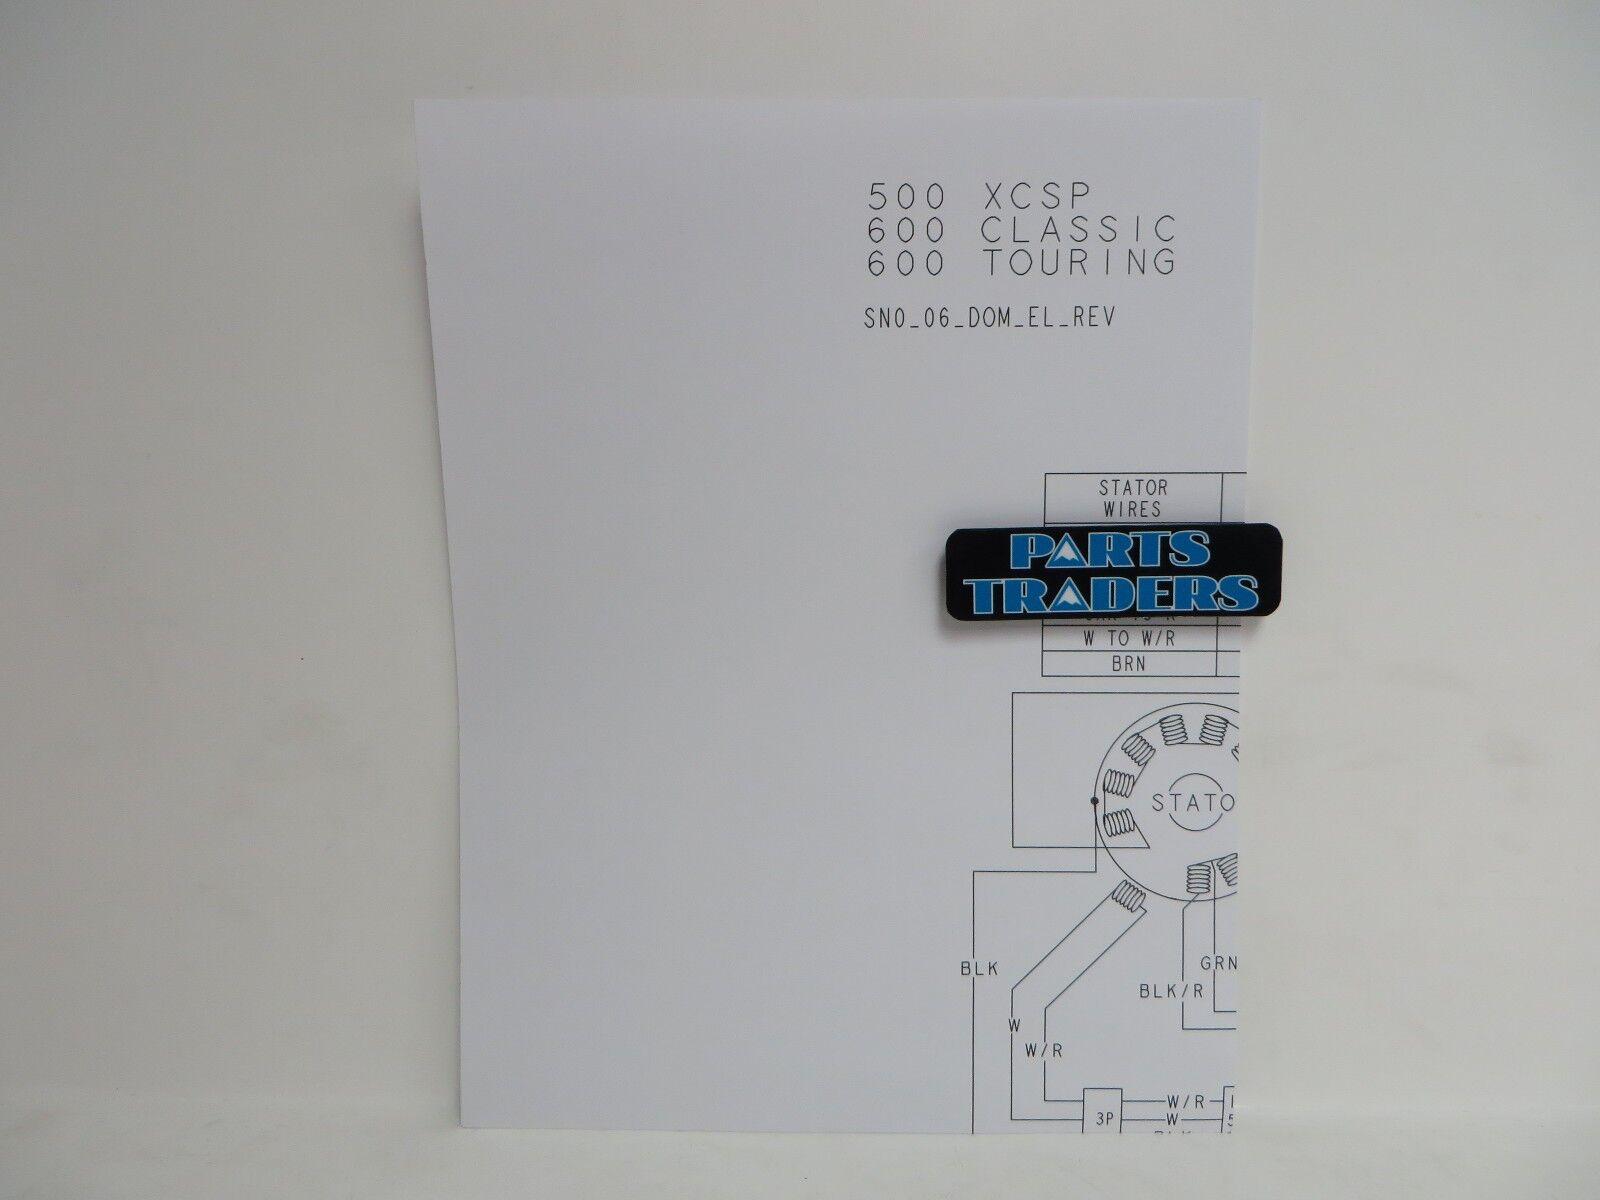 1996 Polaris Xcr 600 Sp Owners Manual